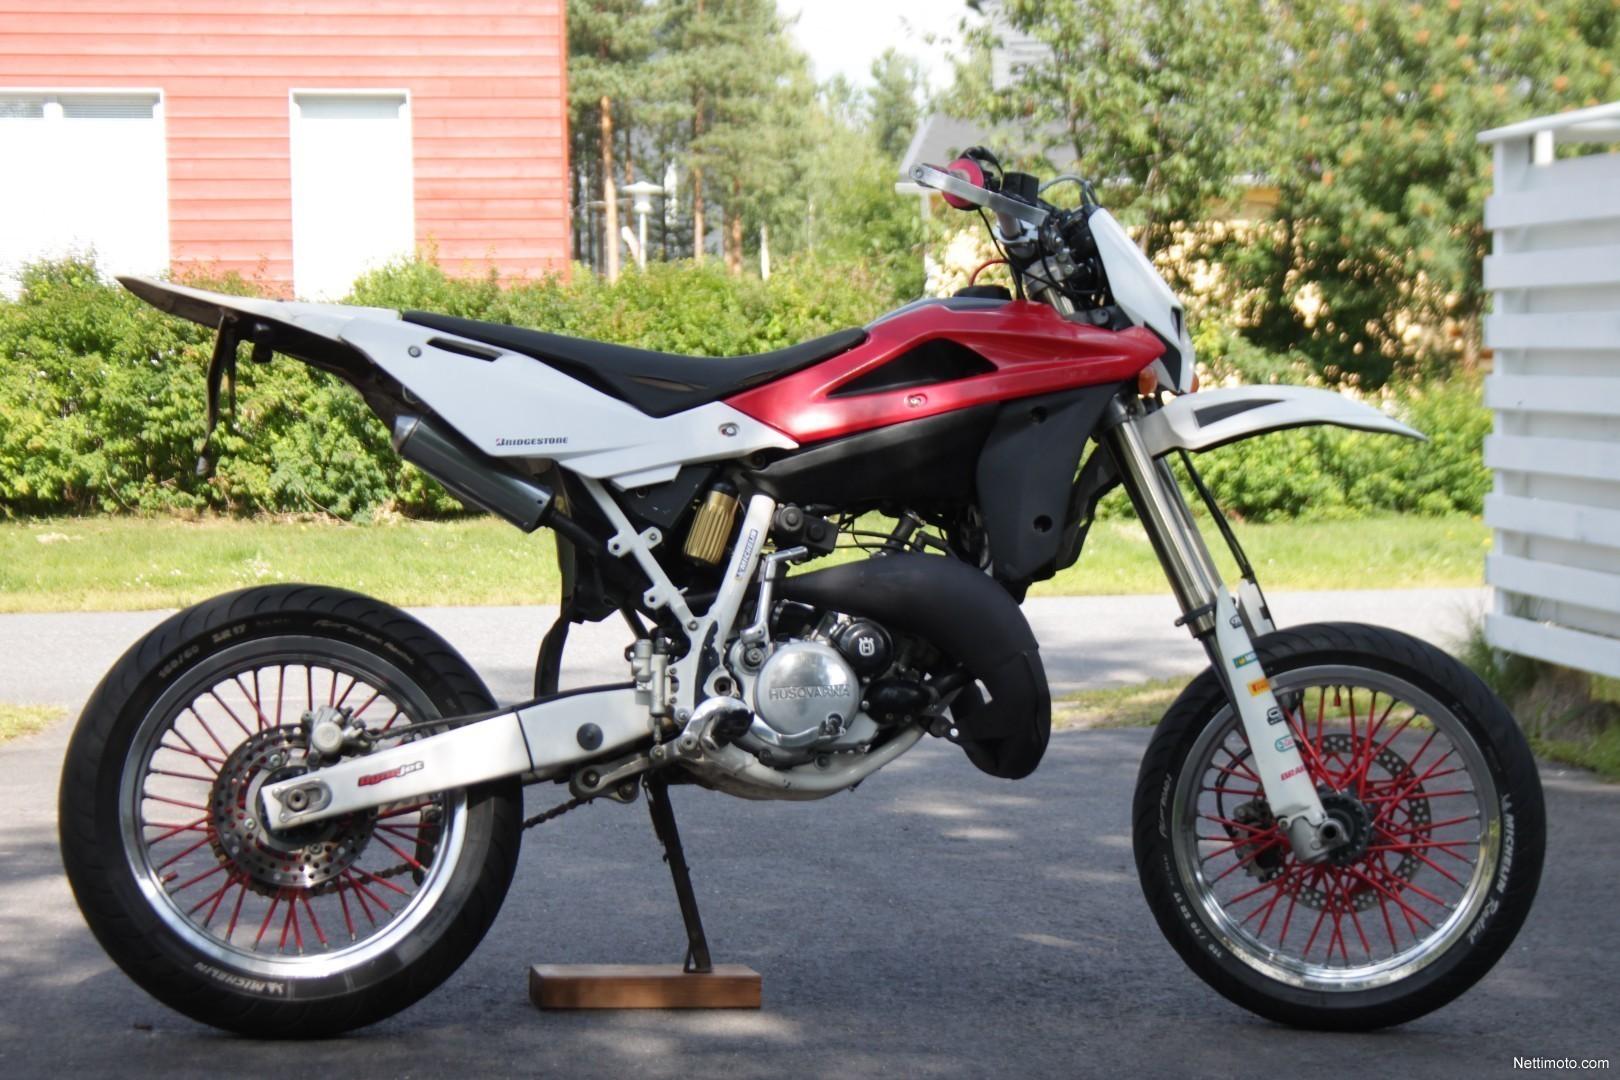 Husqvarna Sm 125 Sm  Wr 125 Cm U00b3 2008 - Oulu - Motorcycle